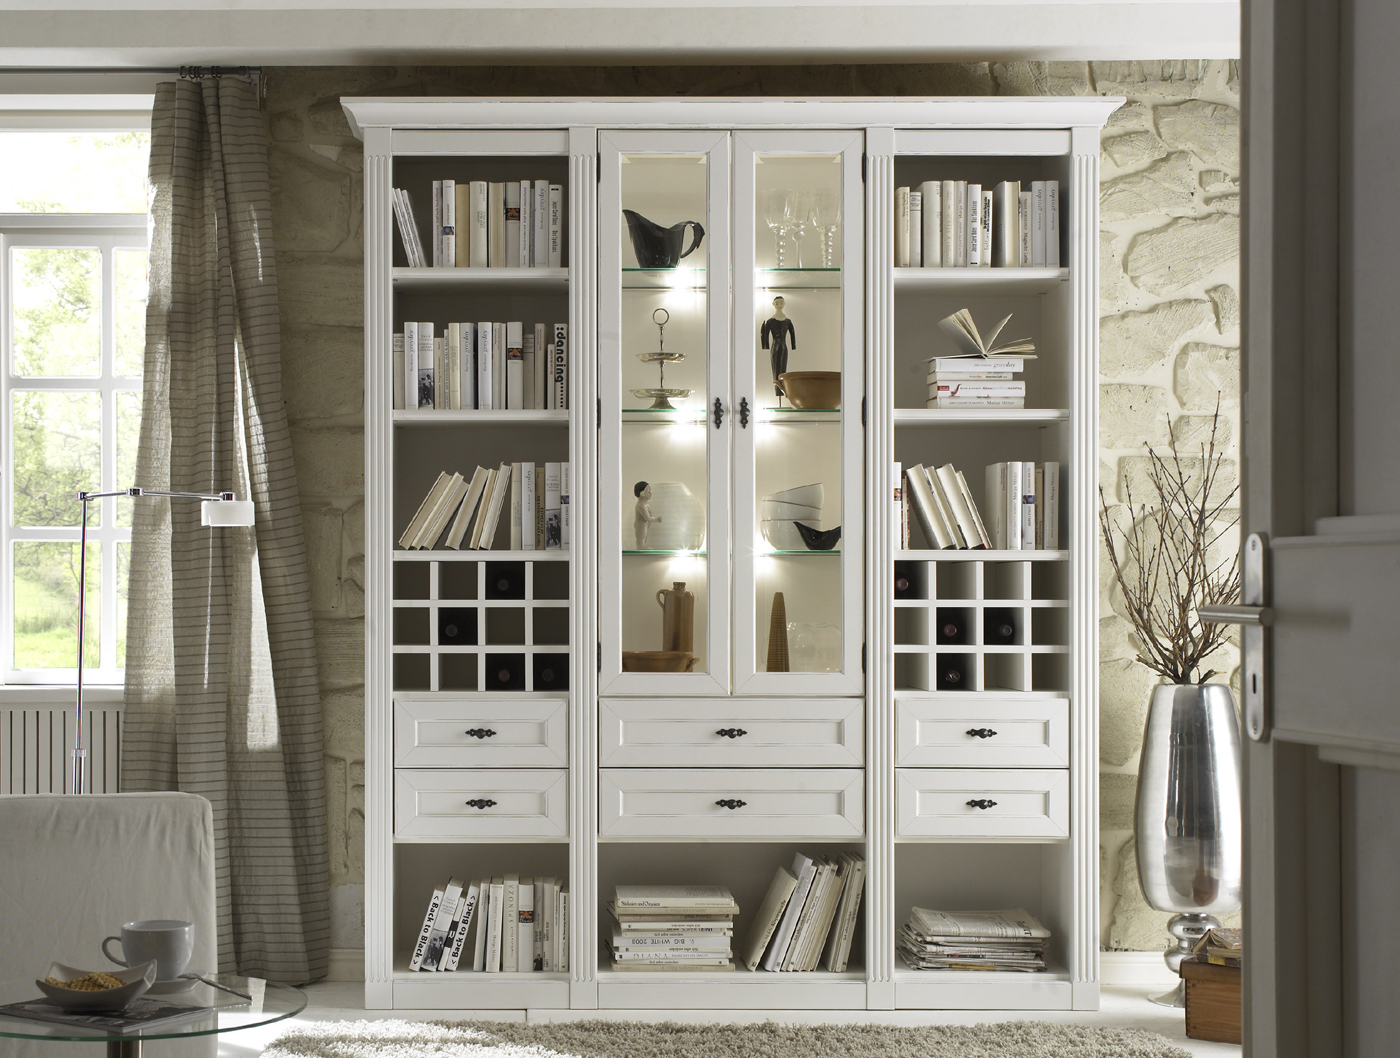 wohnwand b cherregal maison individuell planbar m belmeile24. Black Bedroom Furniture Sets. Home Design Ideas